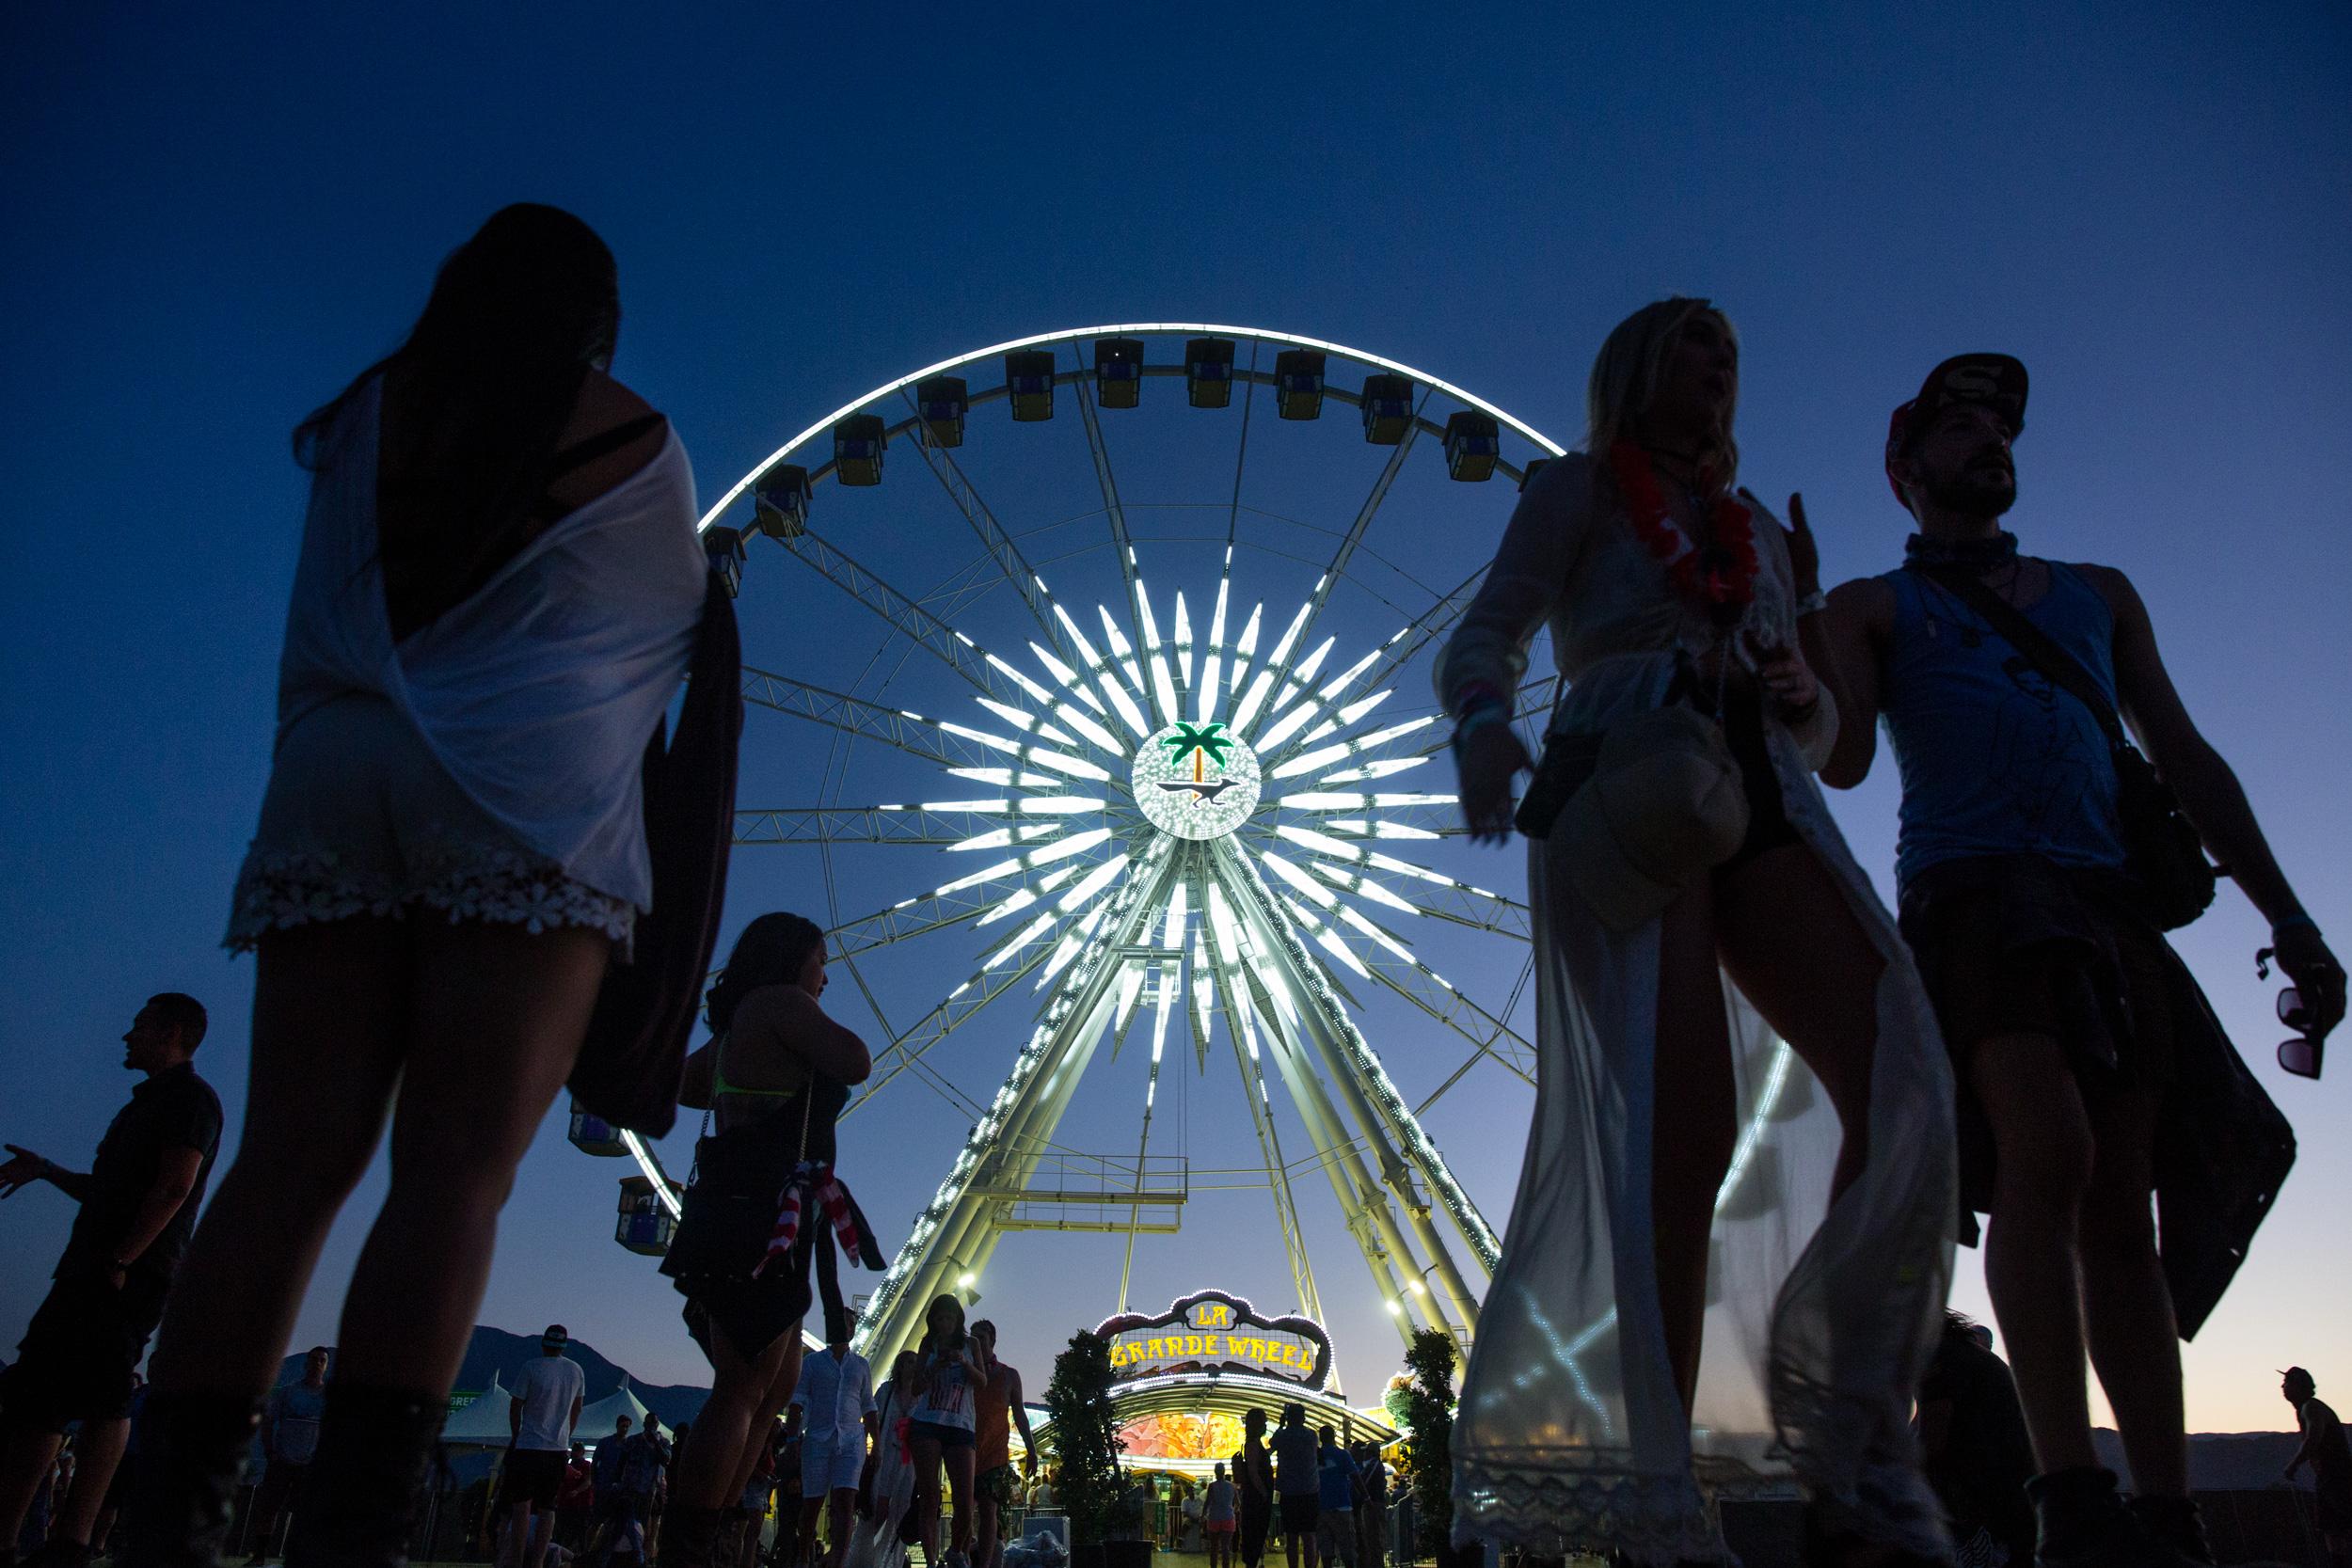 Attendees walk past the Coachella Ferris wheel at the festival entrance.